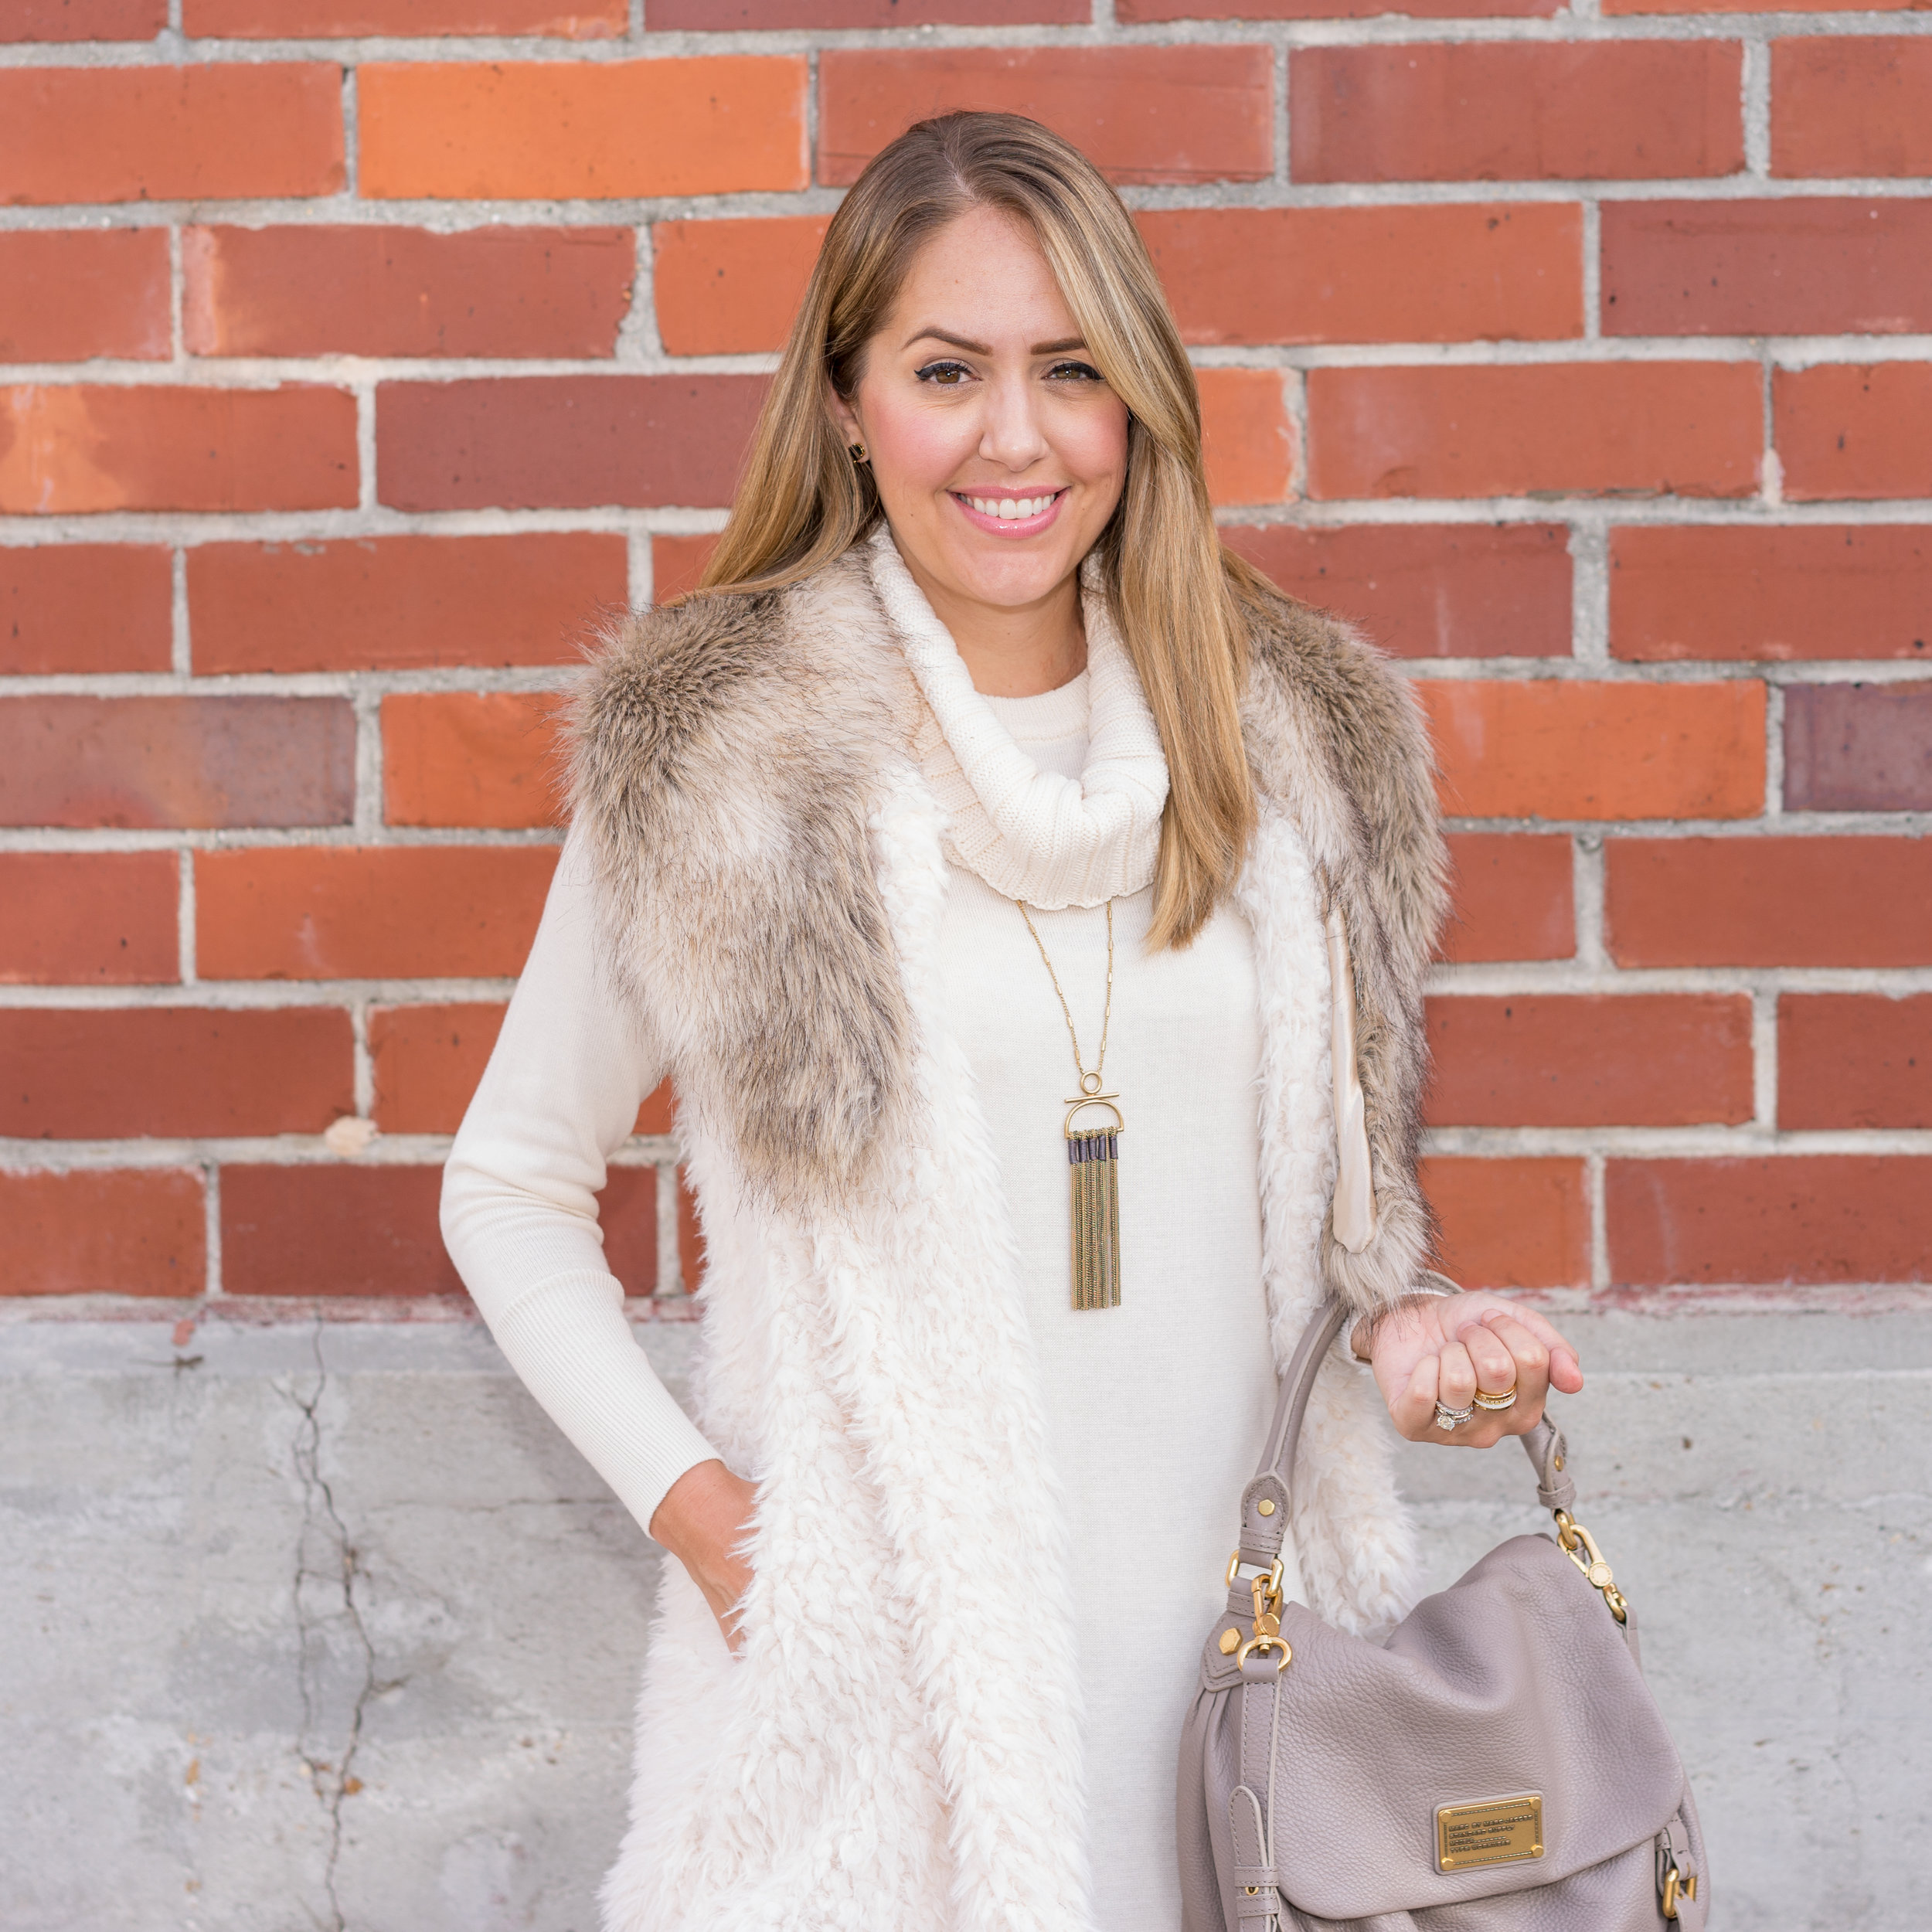 Ivory sweater dress, faux fur vest